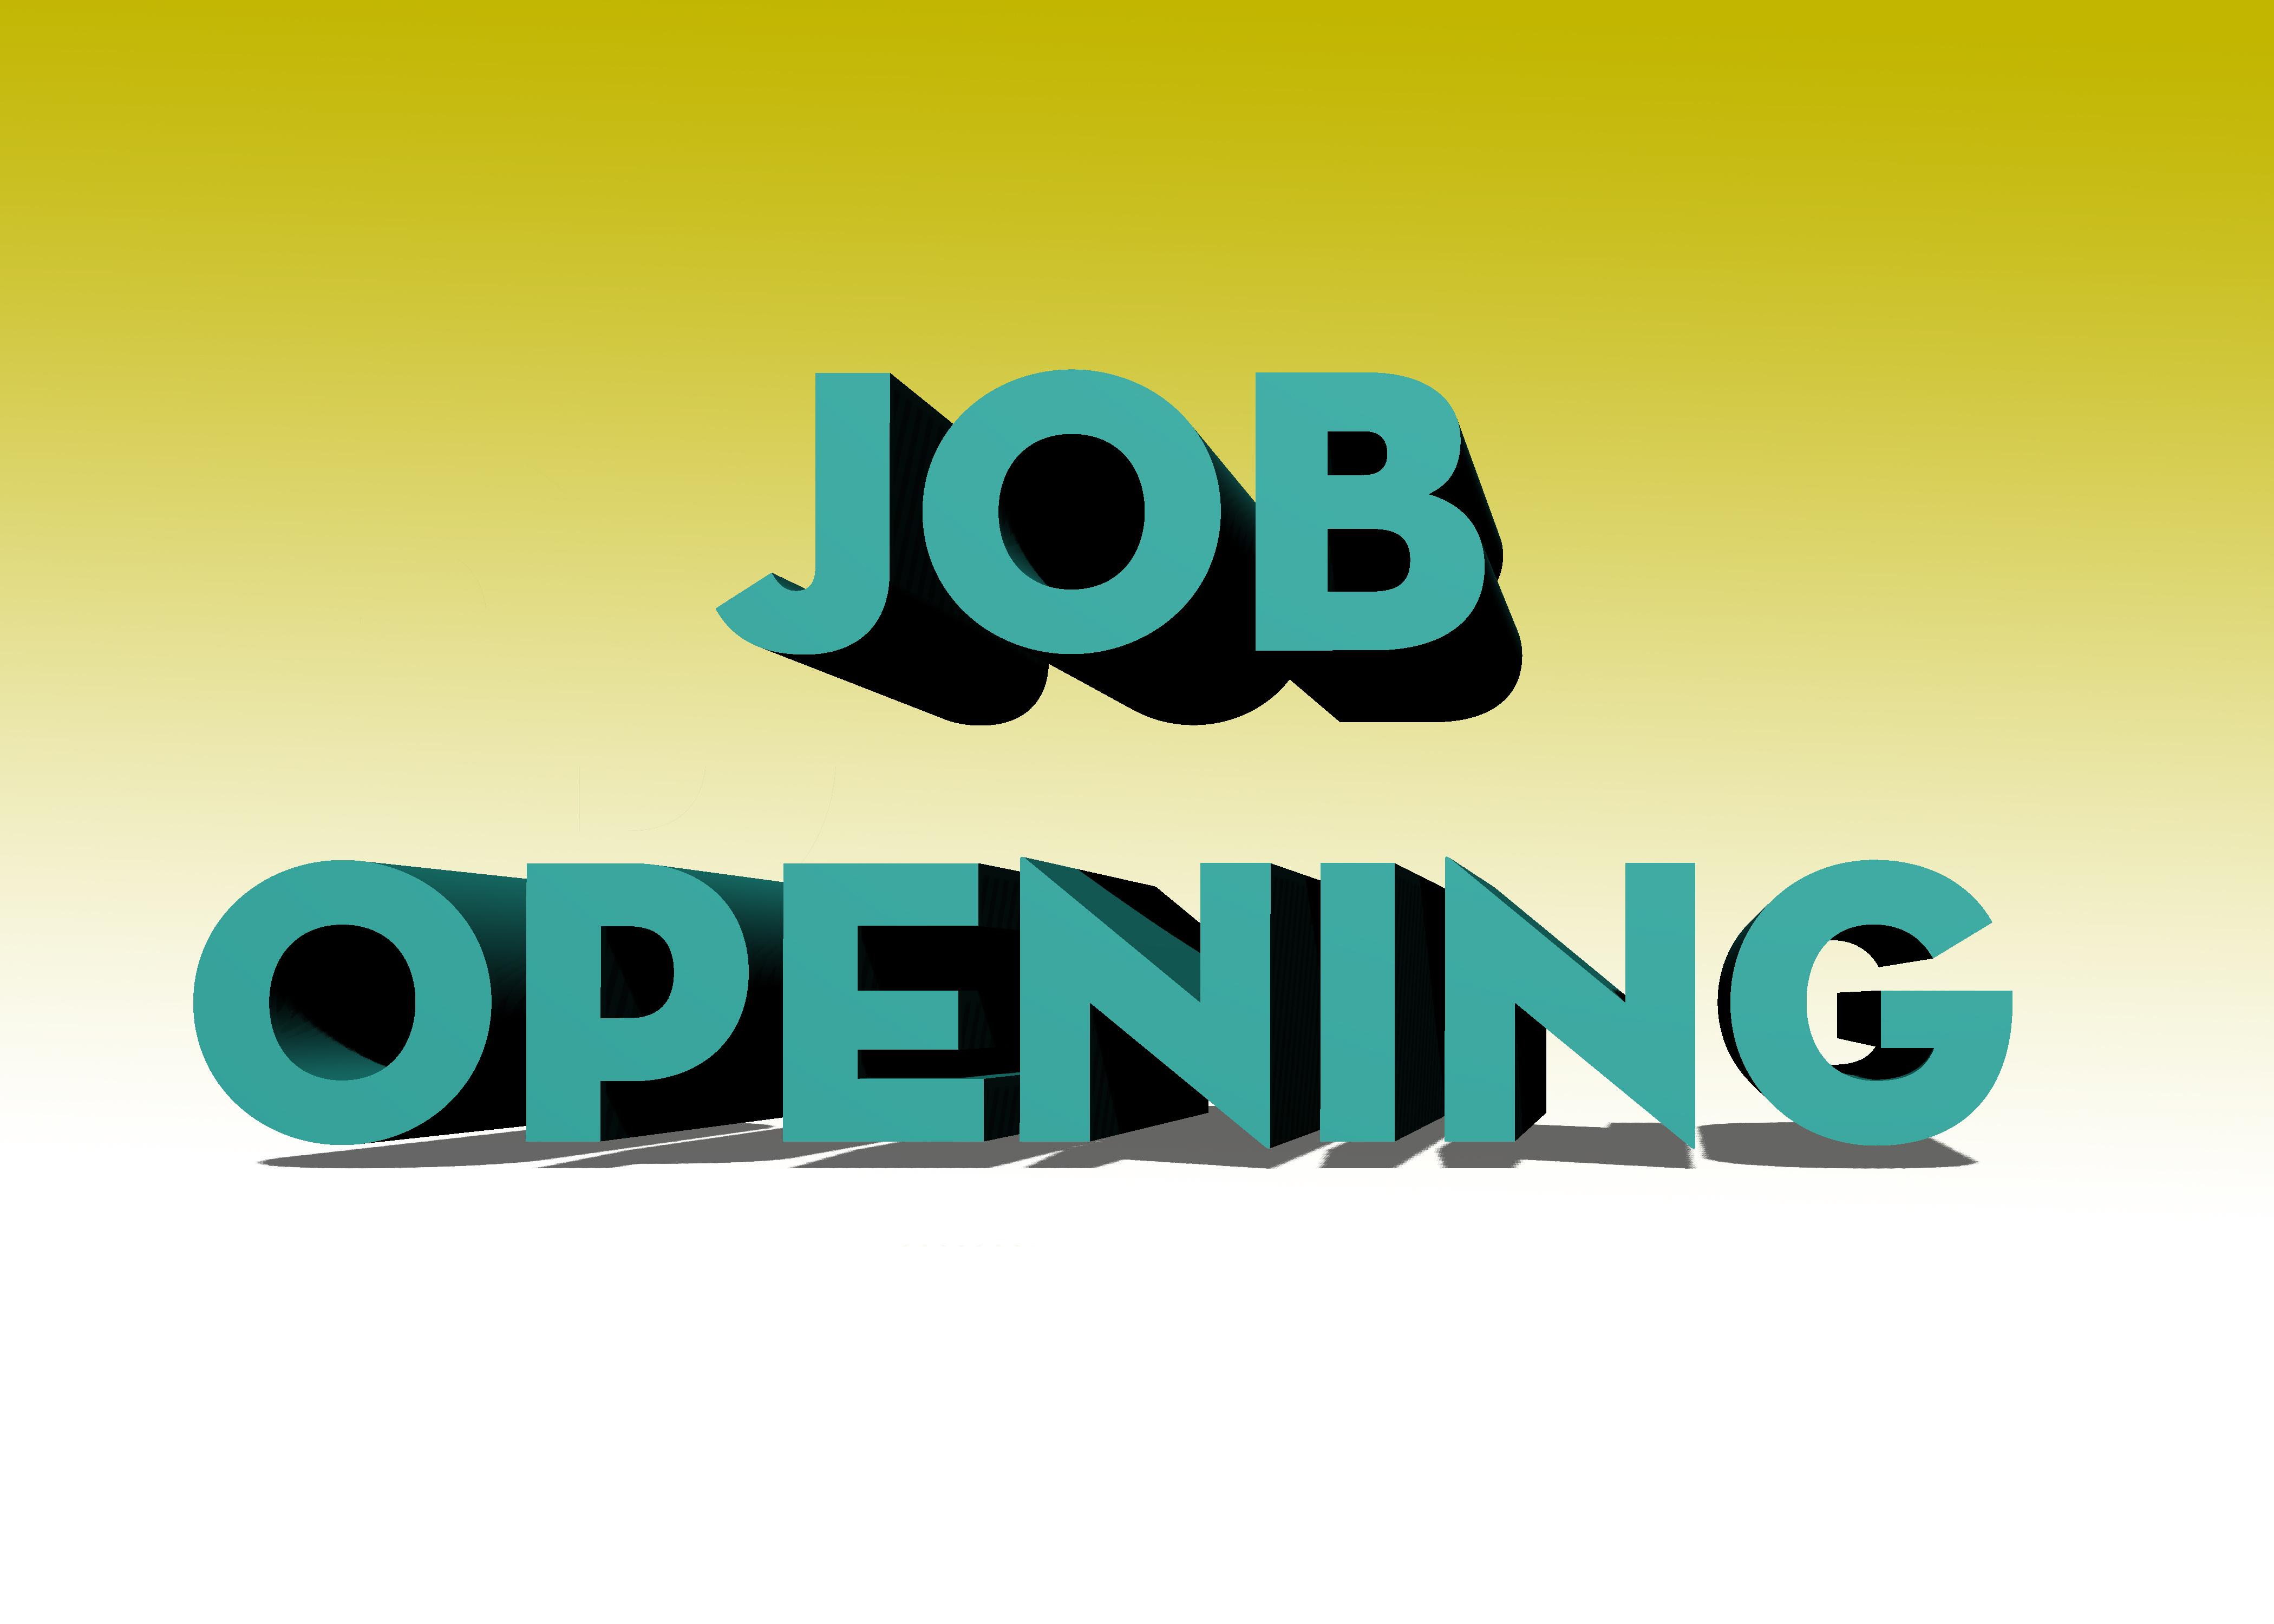 jobopeningnologo